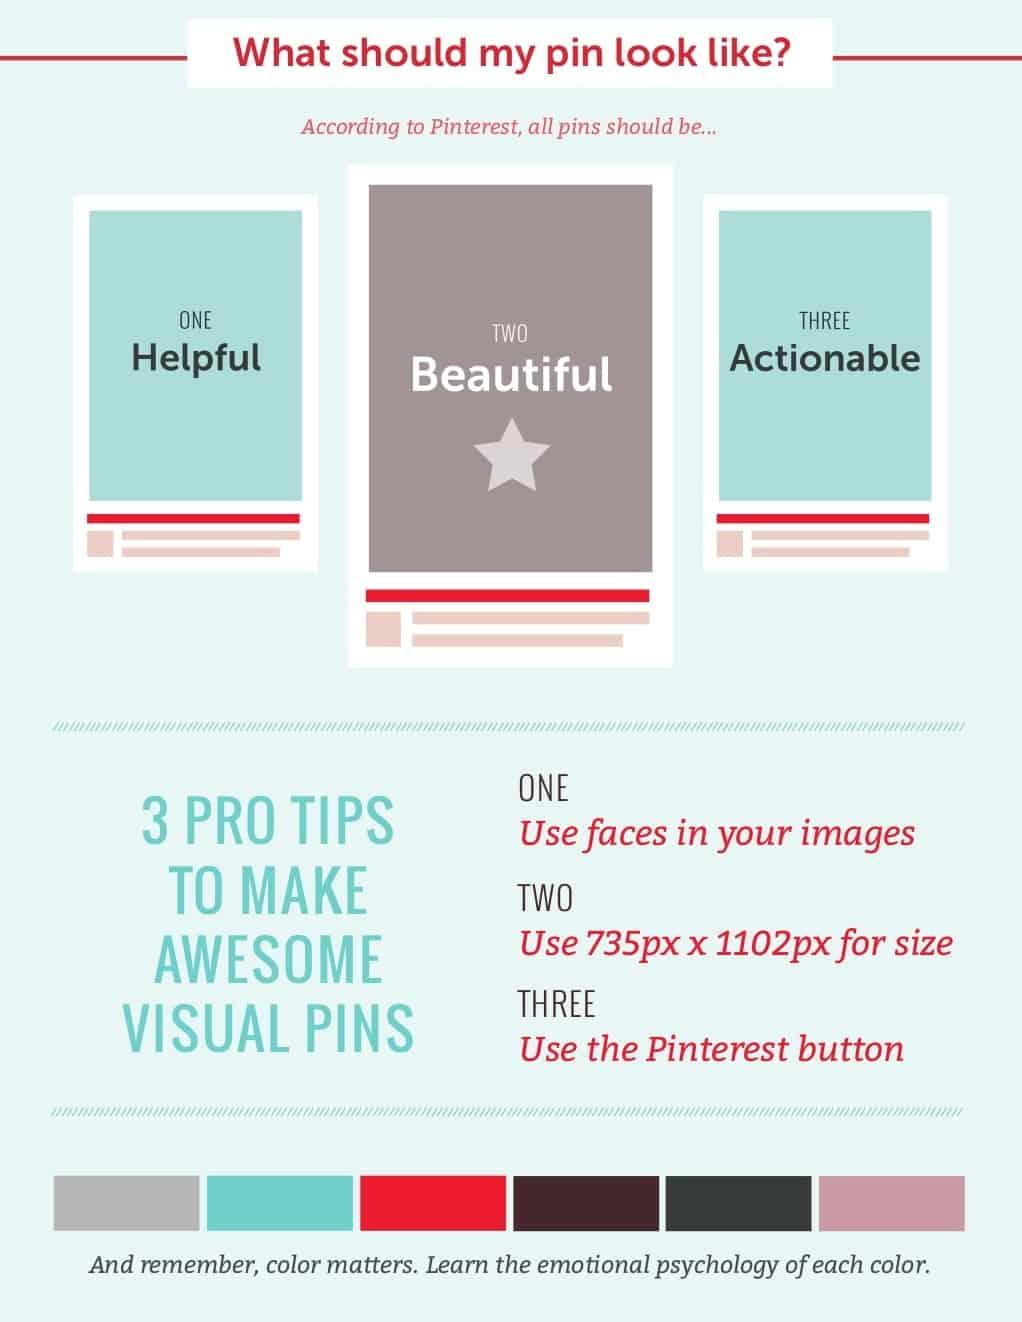 pinterest-infographic-marketing-3